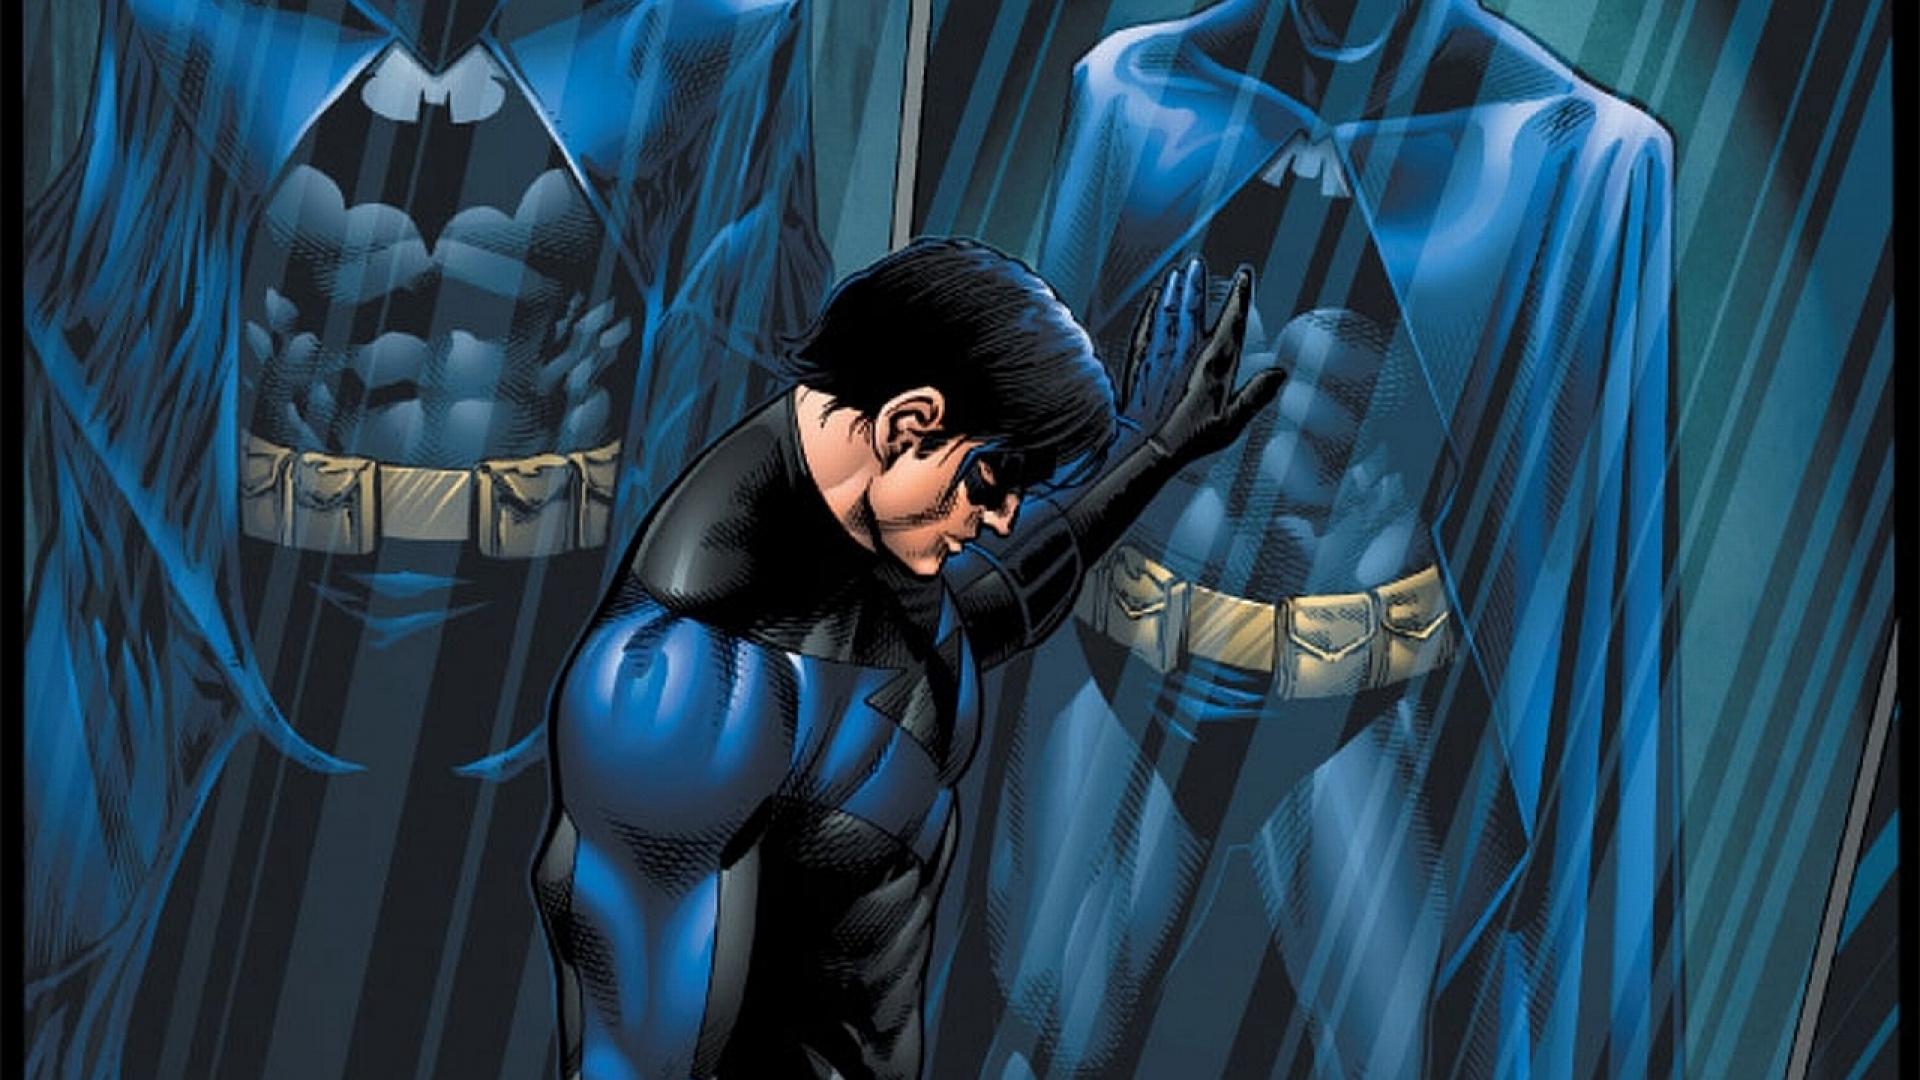 Nightwing HD Wallpaper